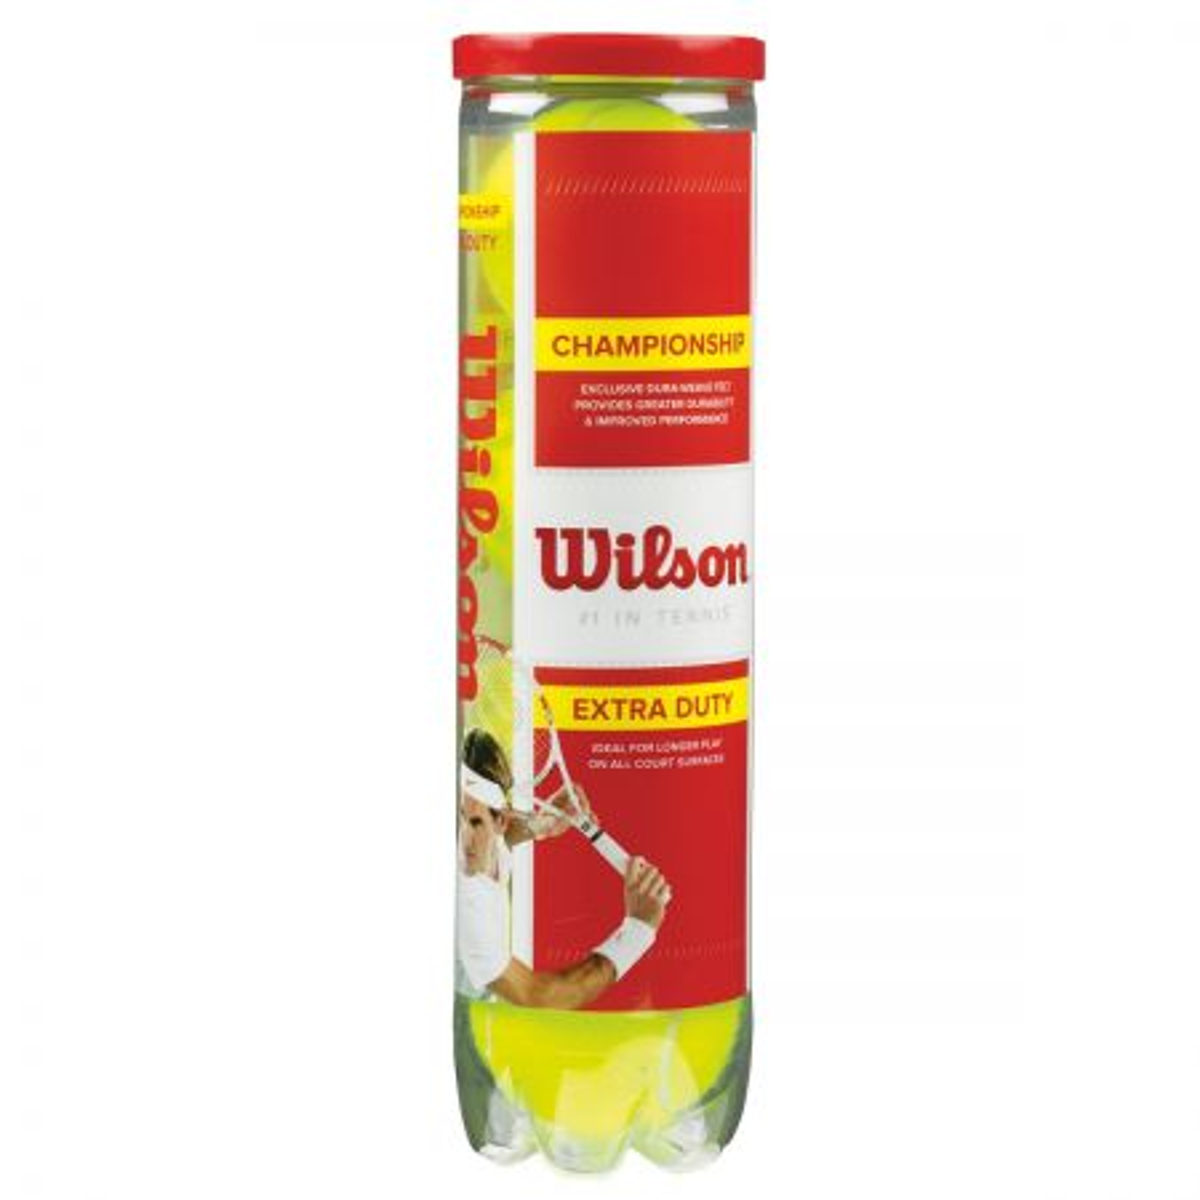 Wilson Championship 4 Ball teniske loptice